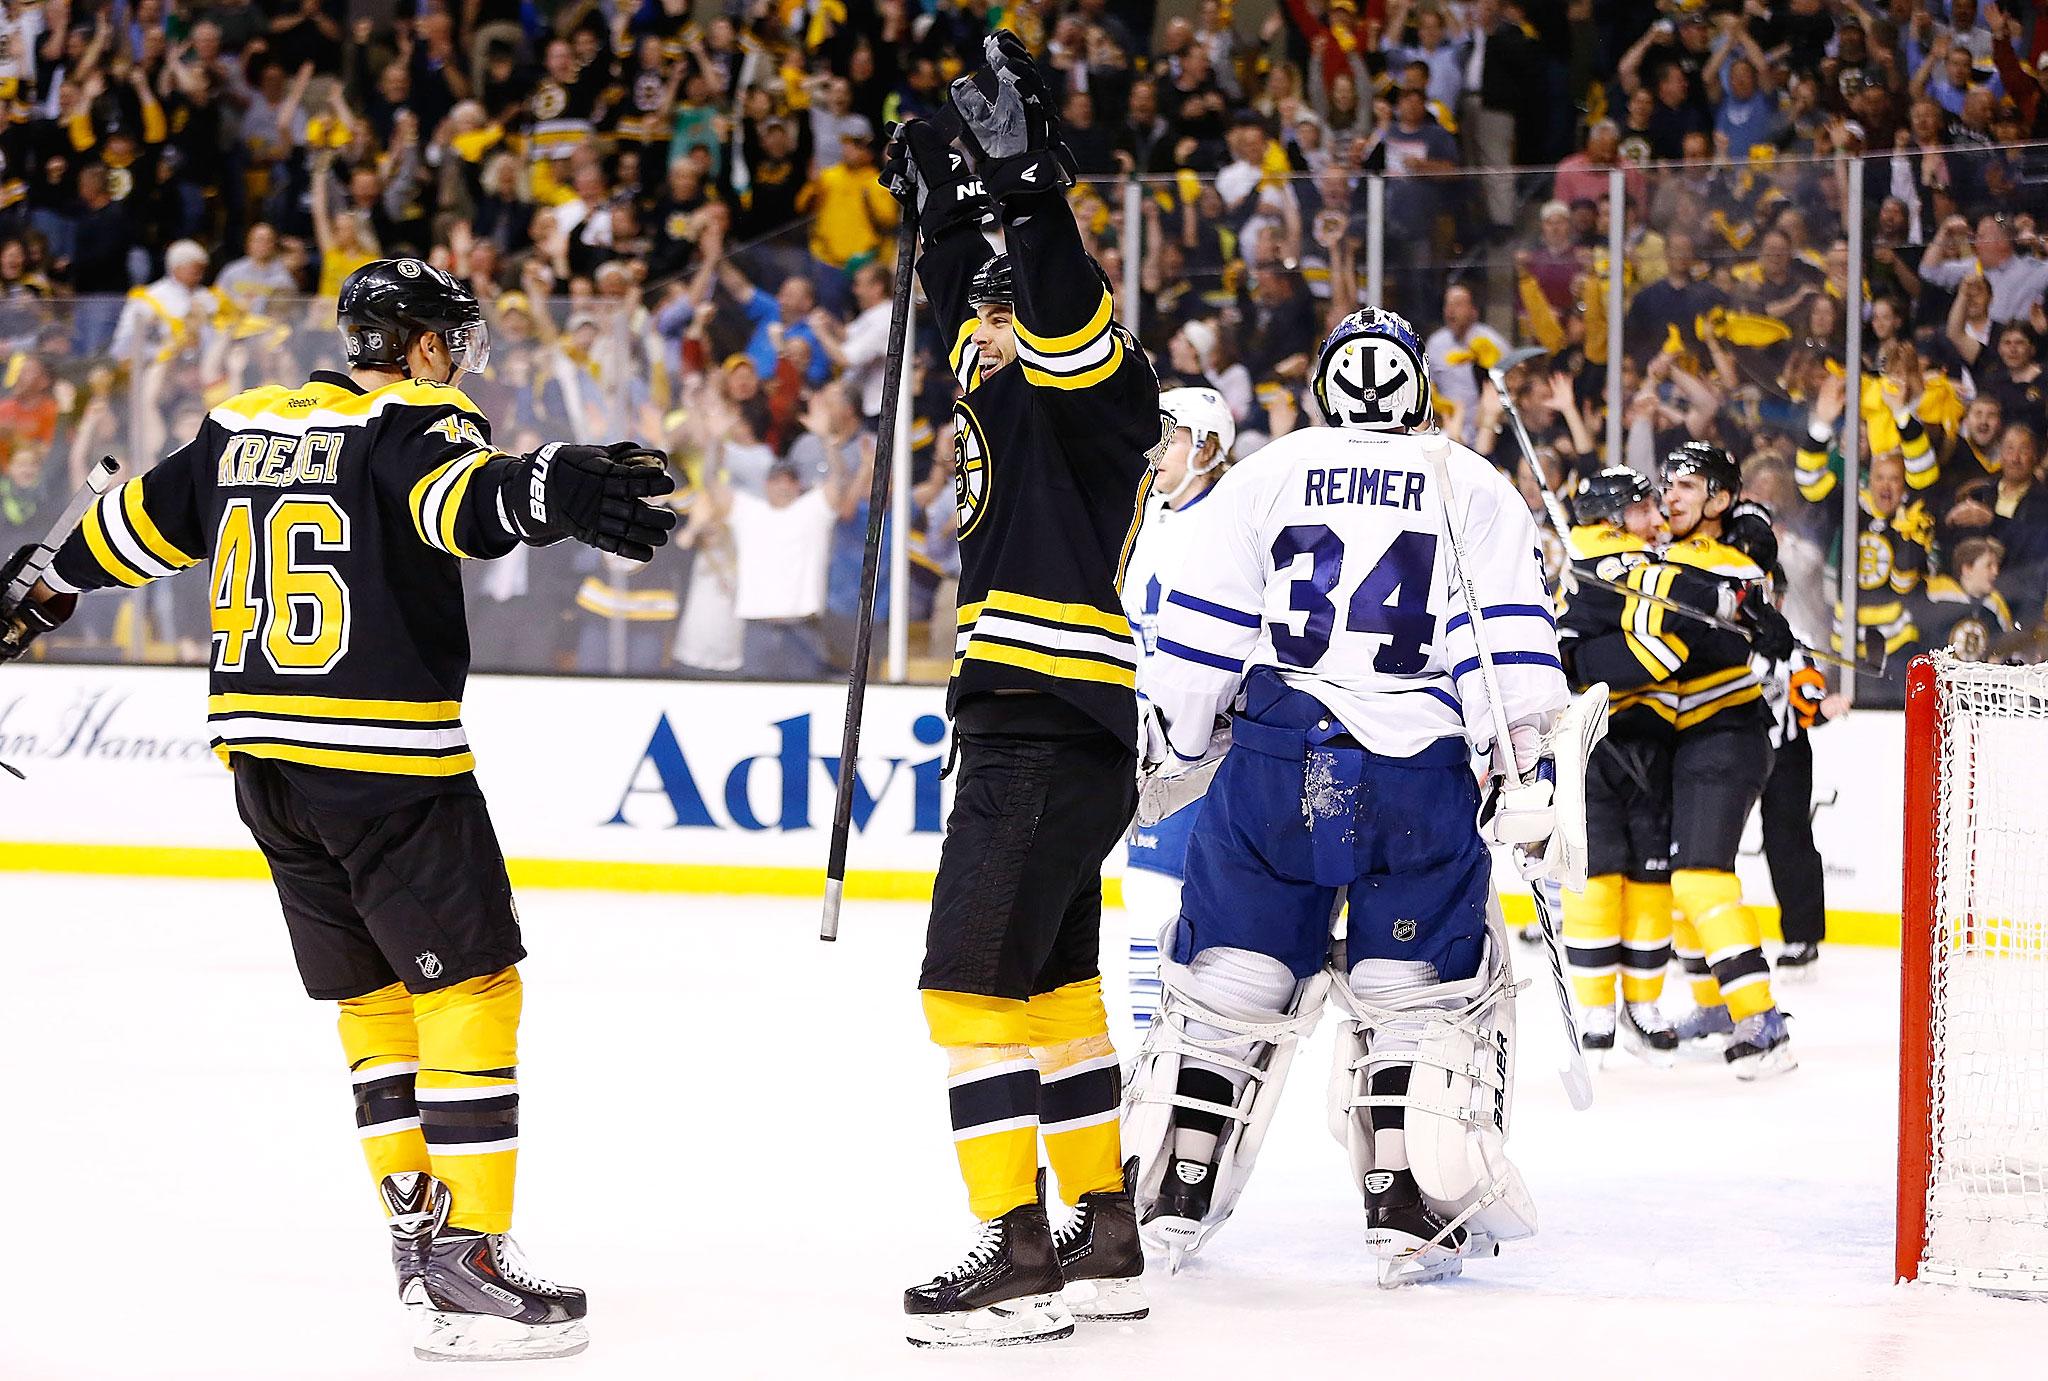 Boston Bruins' 2013 Playoff Run - ESPN